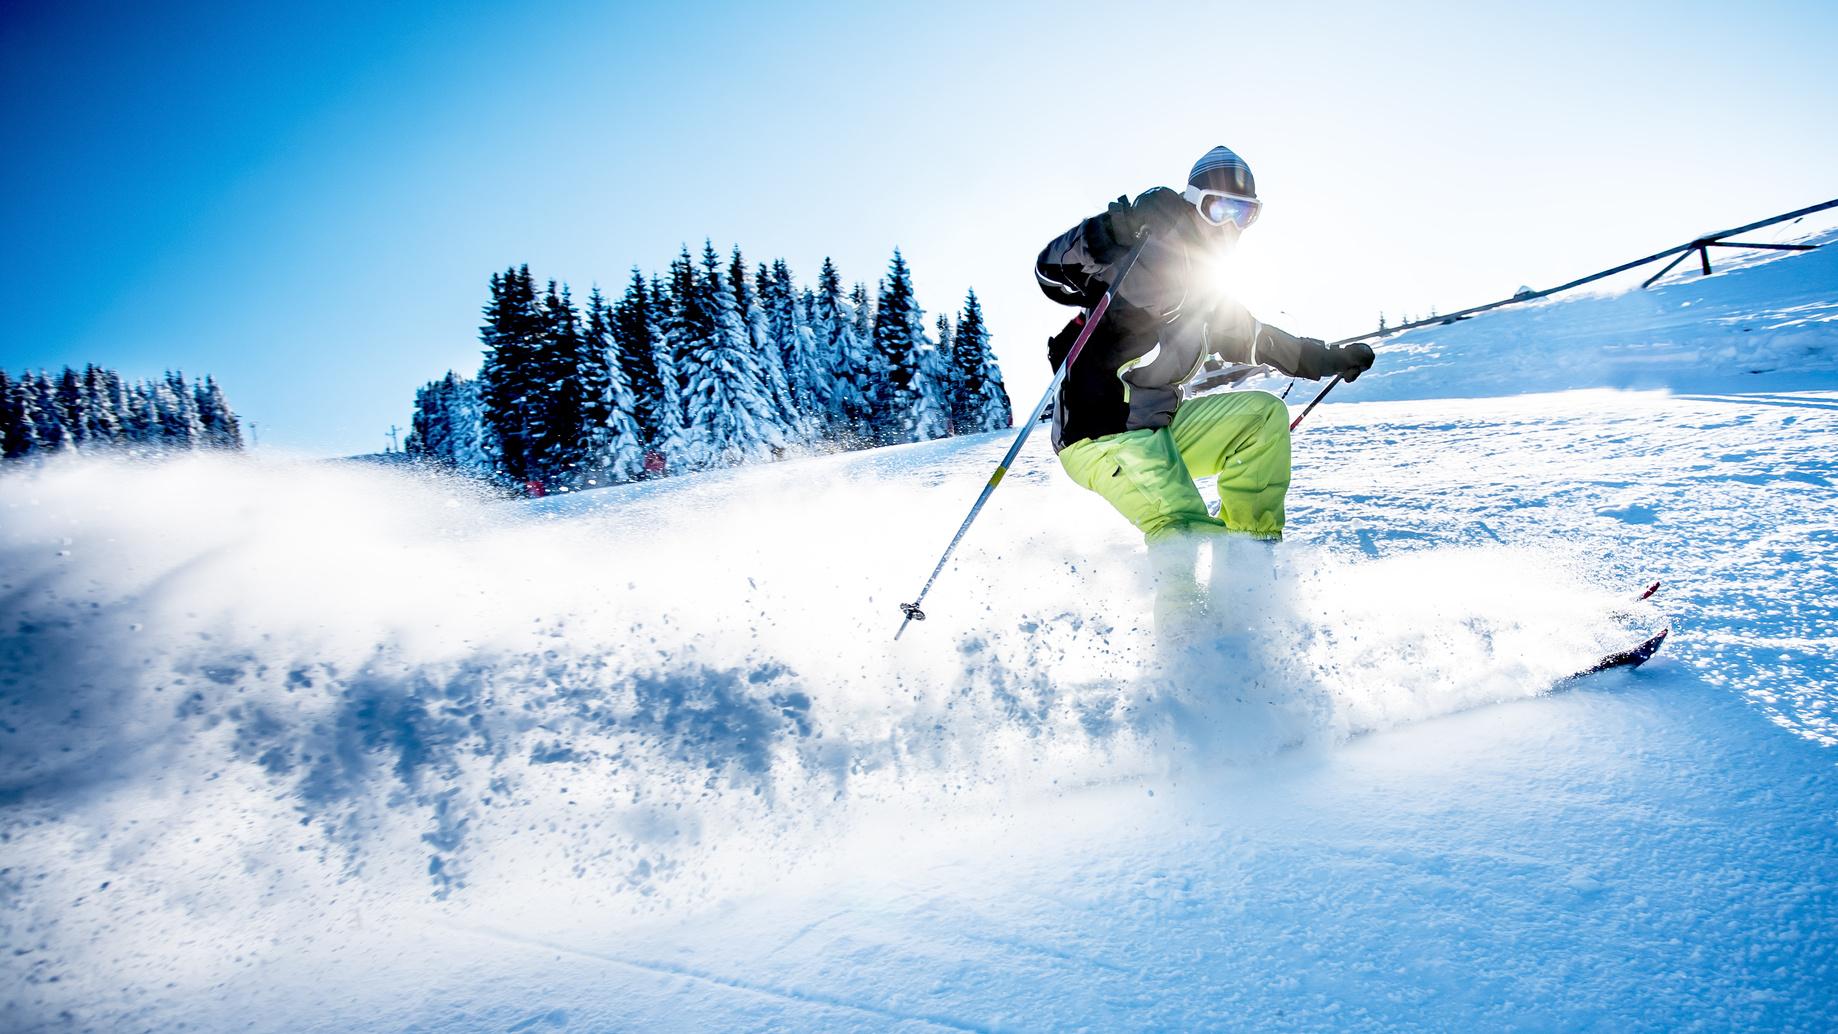 Mt Bachelor - A Skier's Paradise